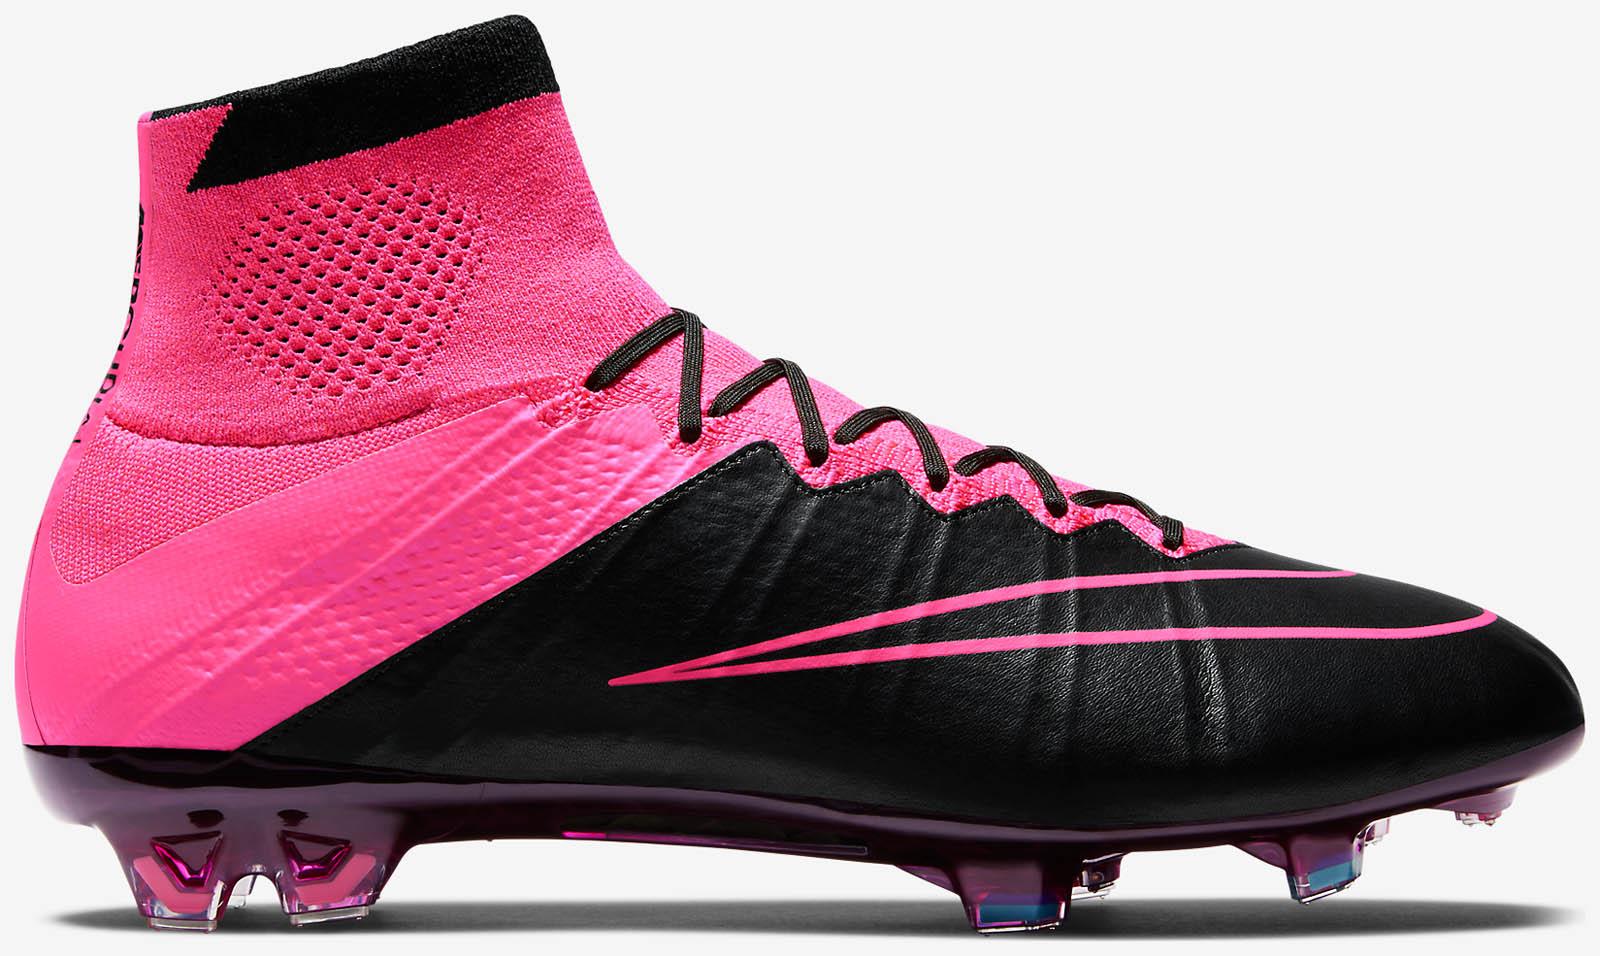 Nike Fussballschuhe Pink Schwarz Legasthenie Deutschland De